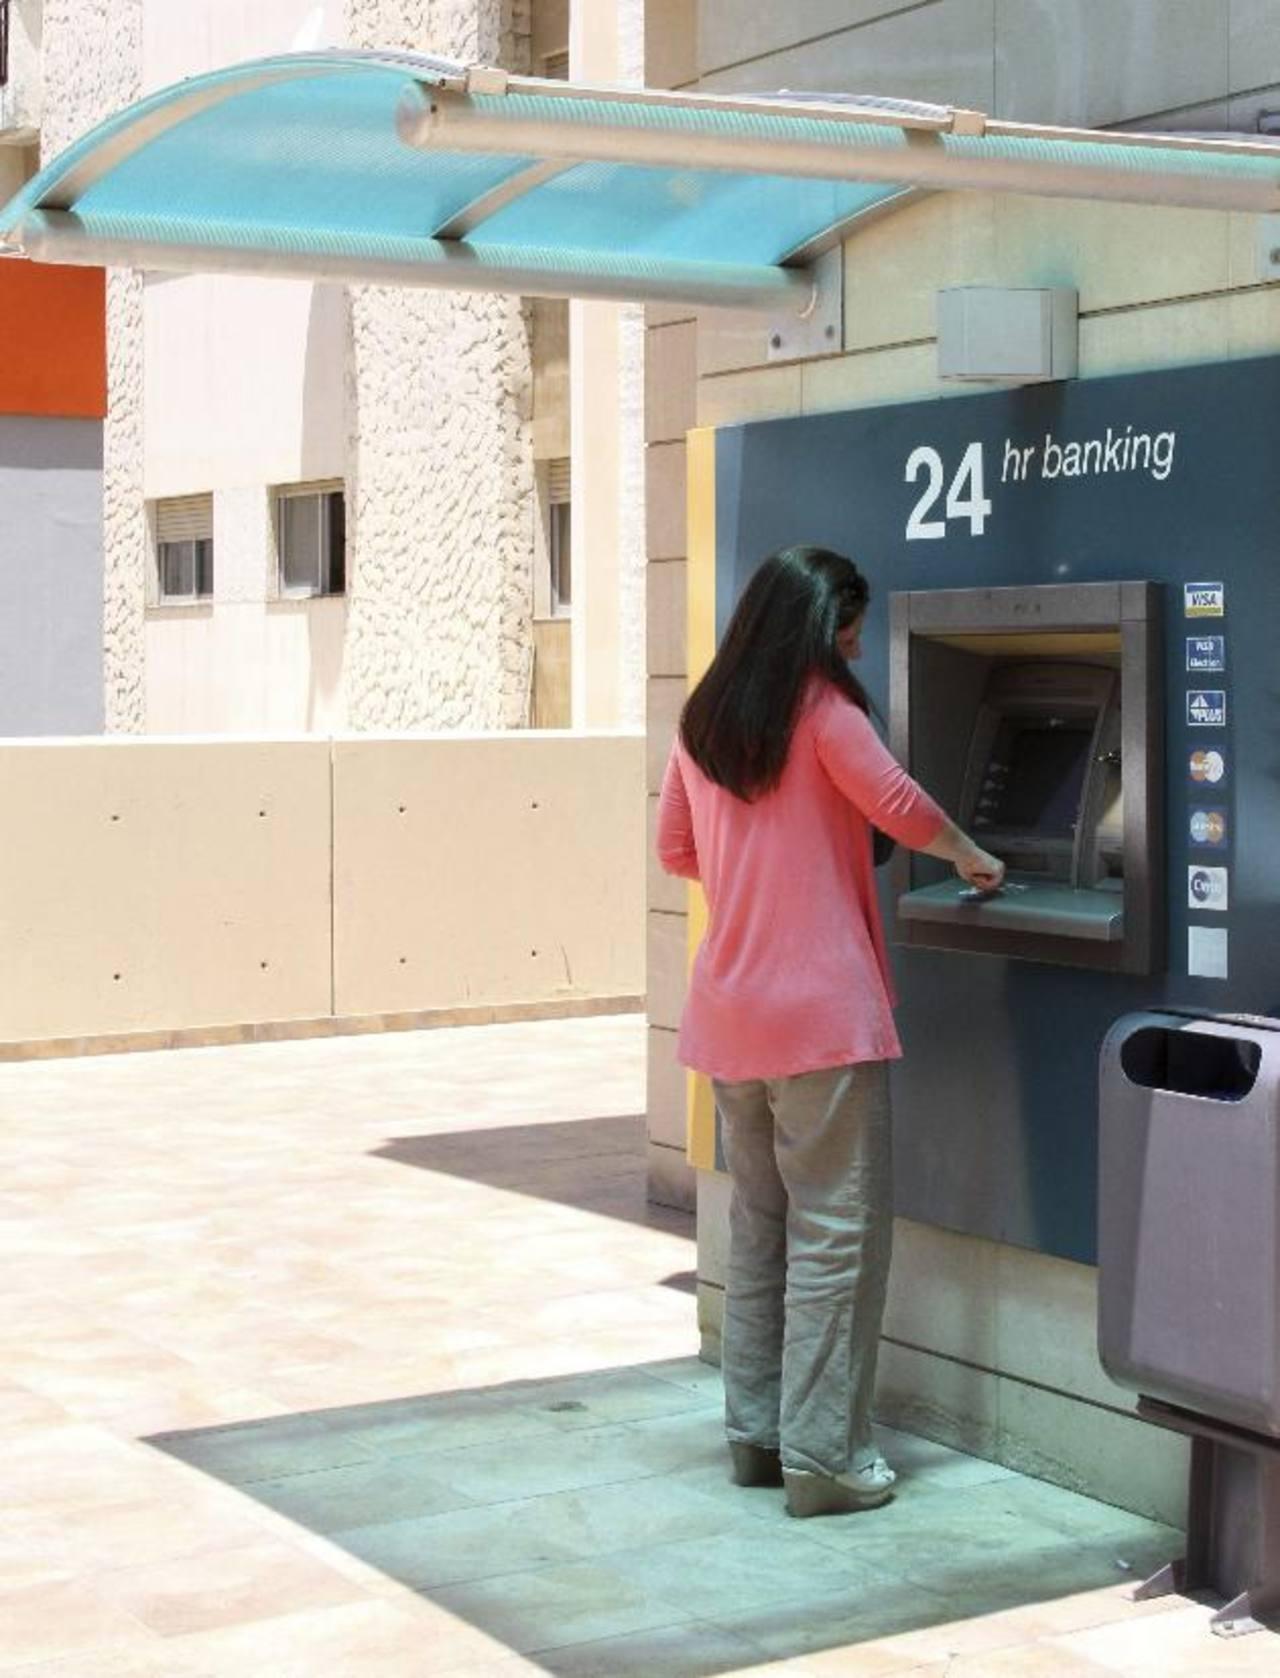 Chipre en la bancarrota. FOTO EDH Agencias.